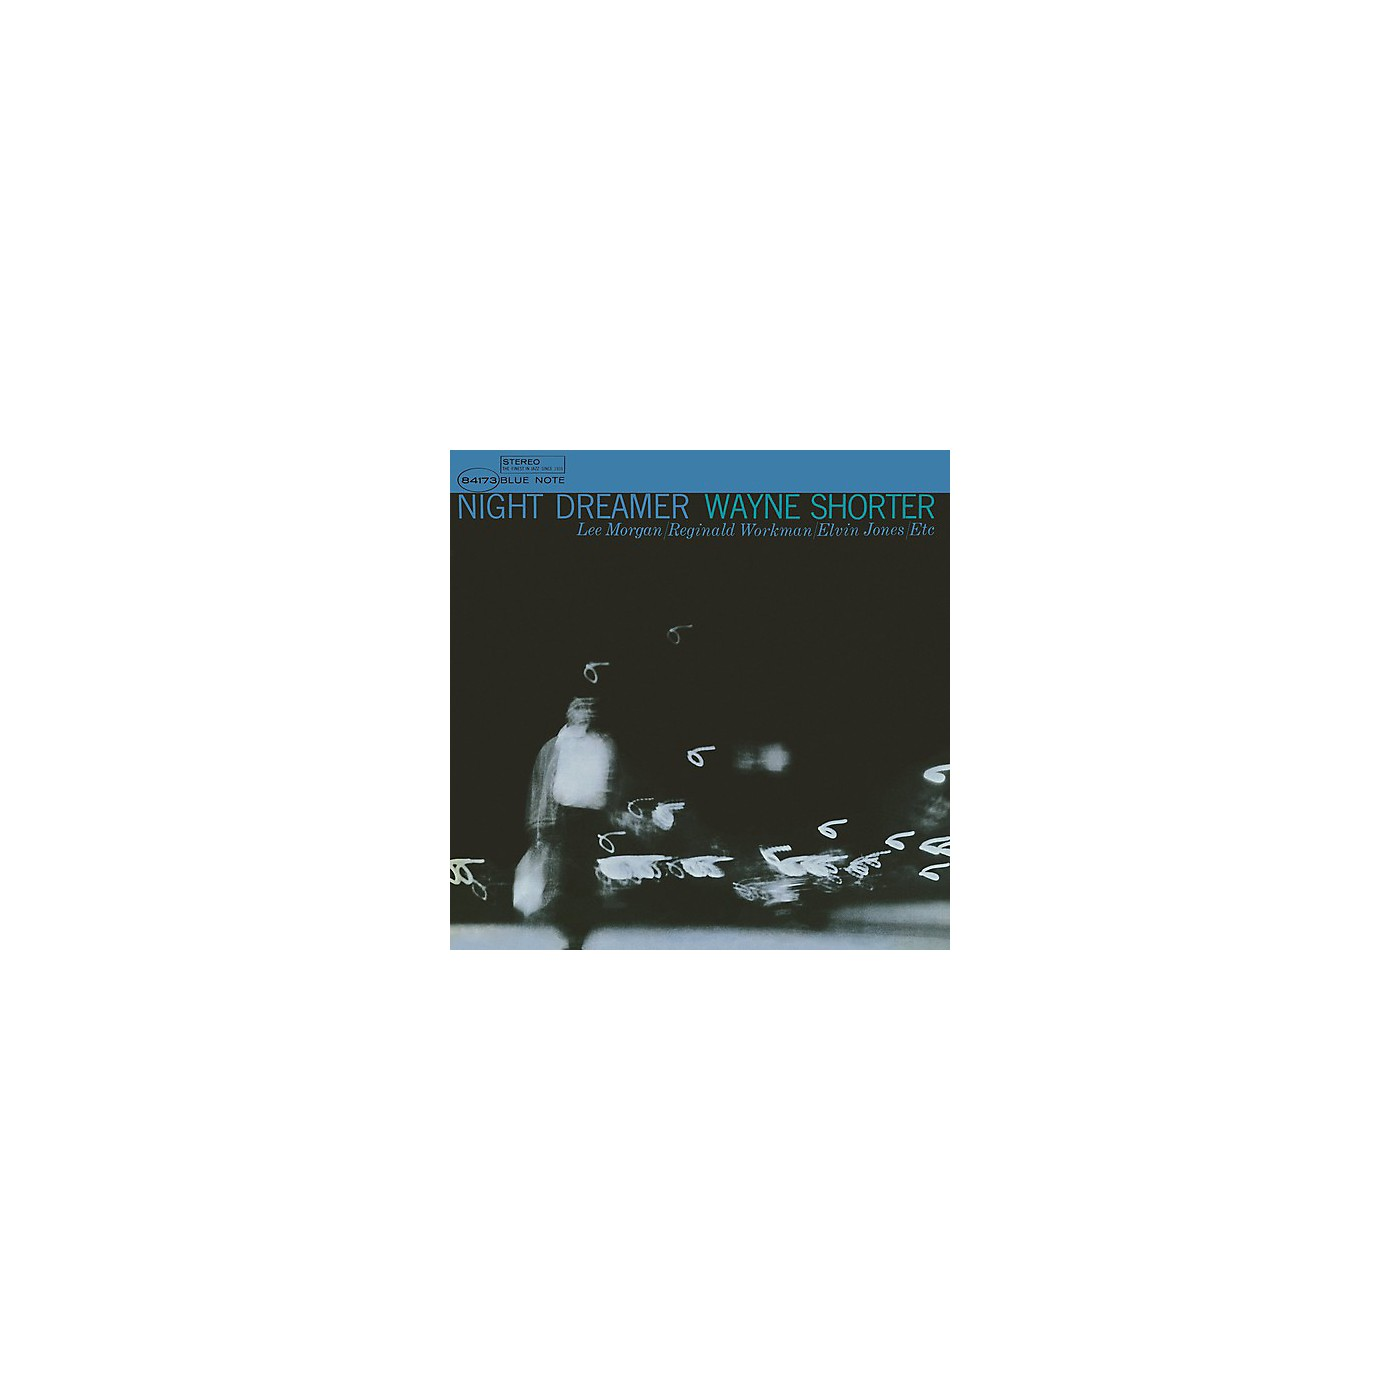 Alliance Wayne Shorter - Night Dreamer (LP) thumbnail